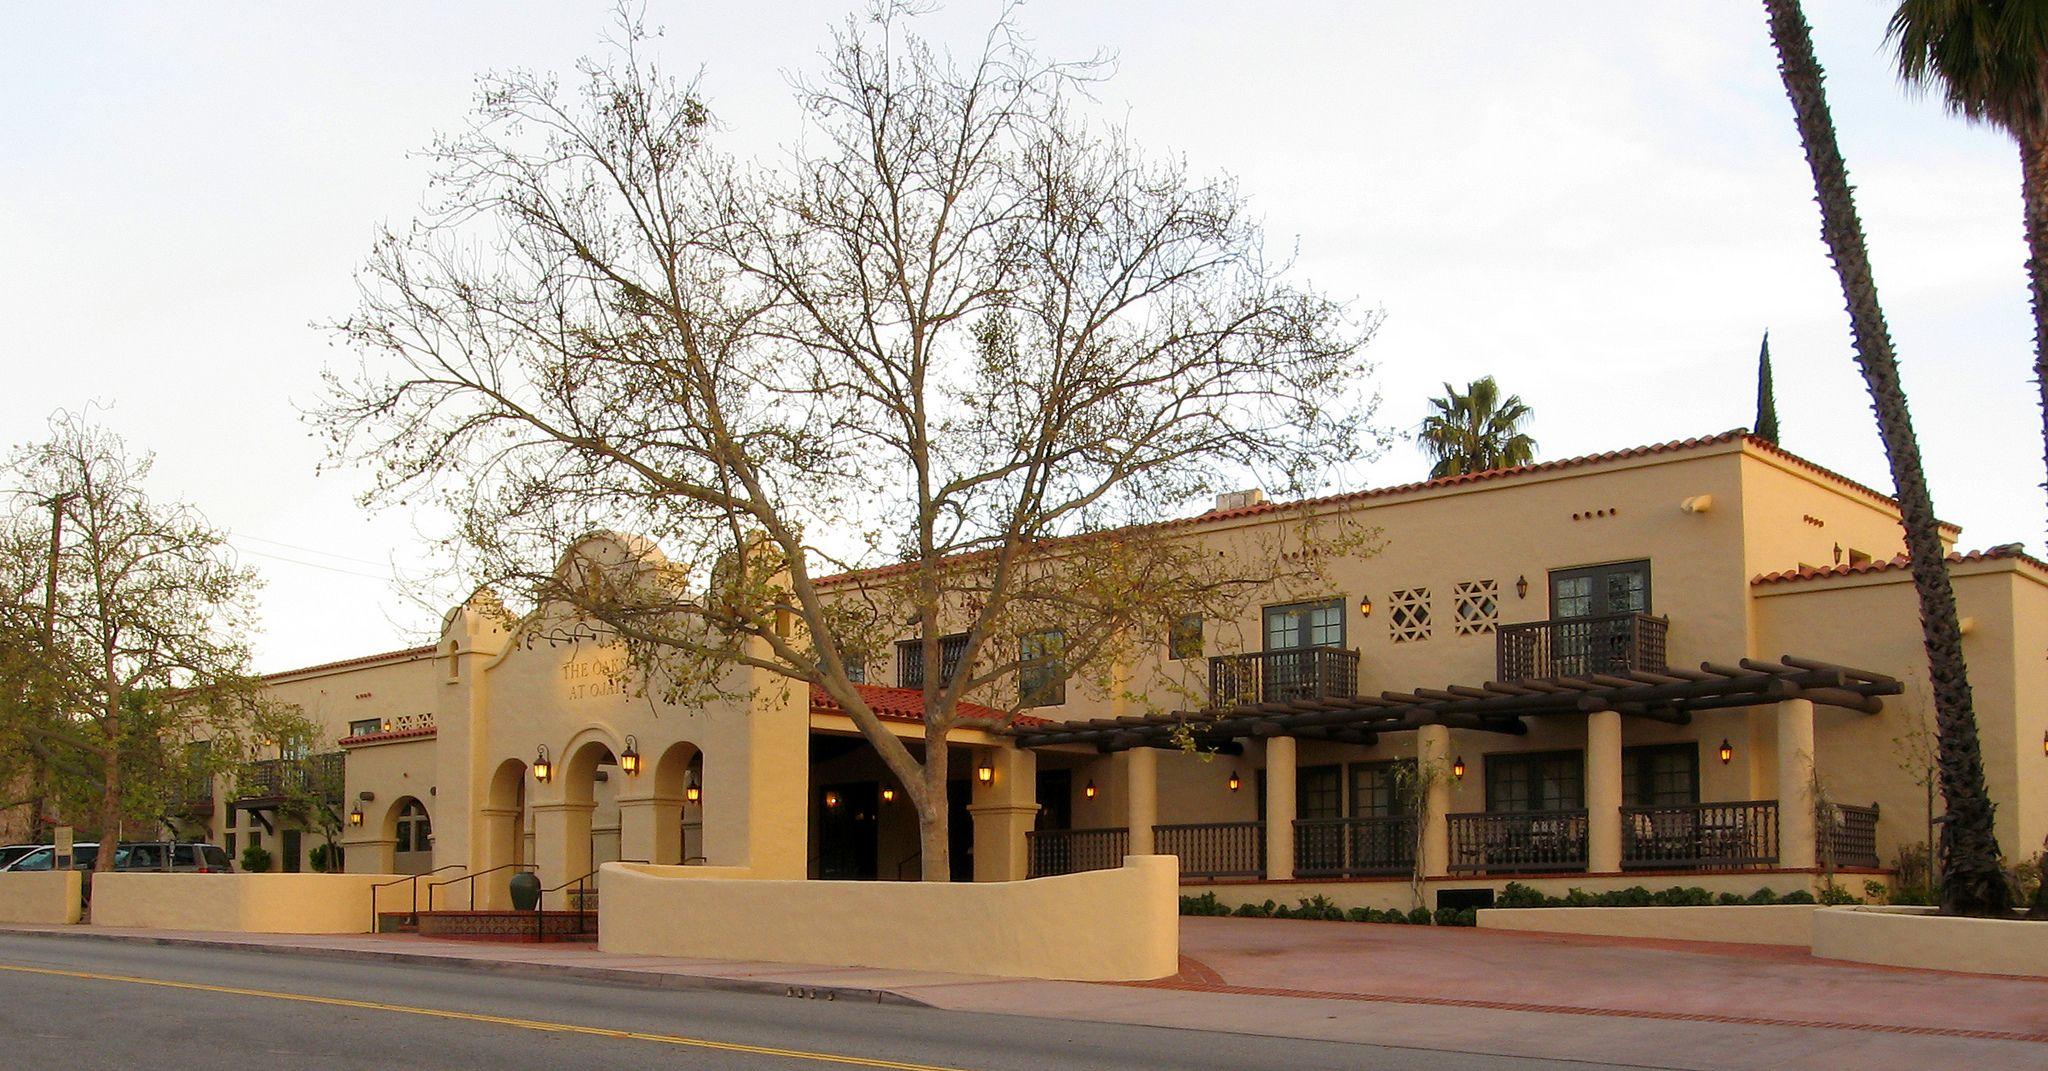 The-Oaks-at-Ojai-Exclusive-Destination-Spa-Luxury-Travel-Magazine-Oaks-Spa-Beverly-Hills-Magazine